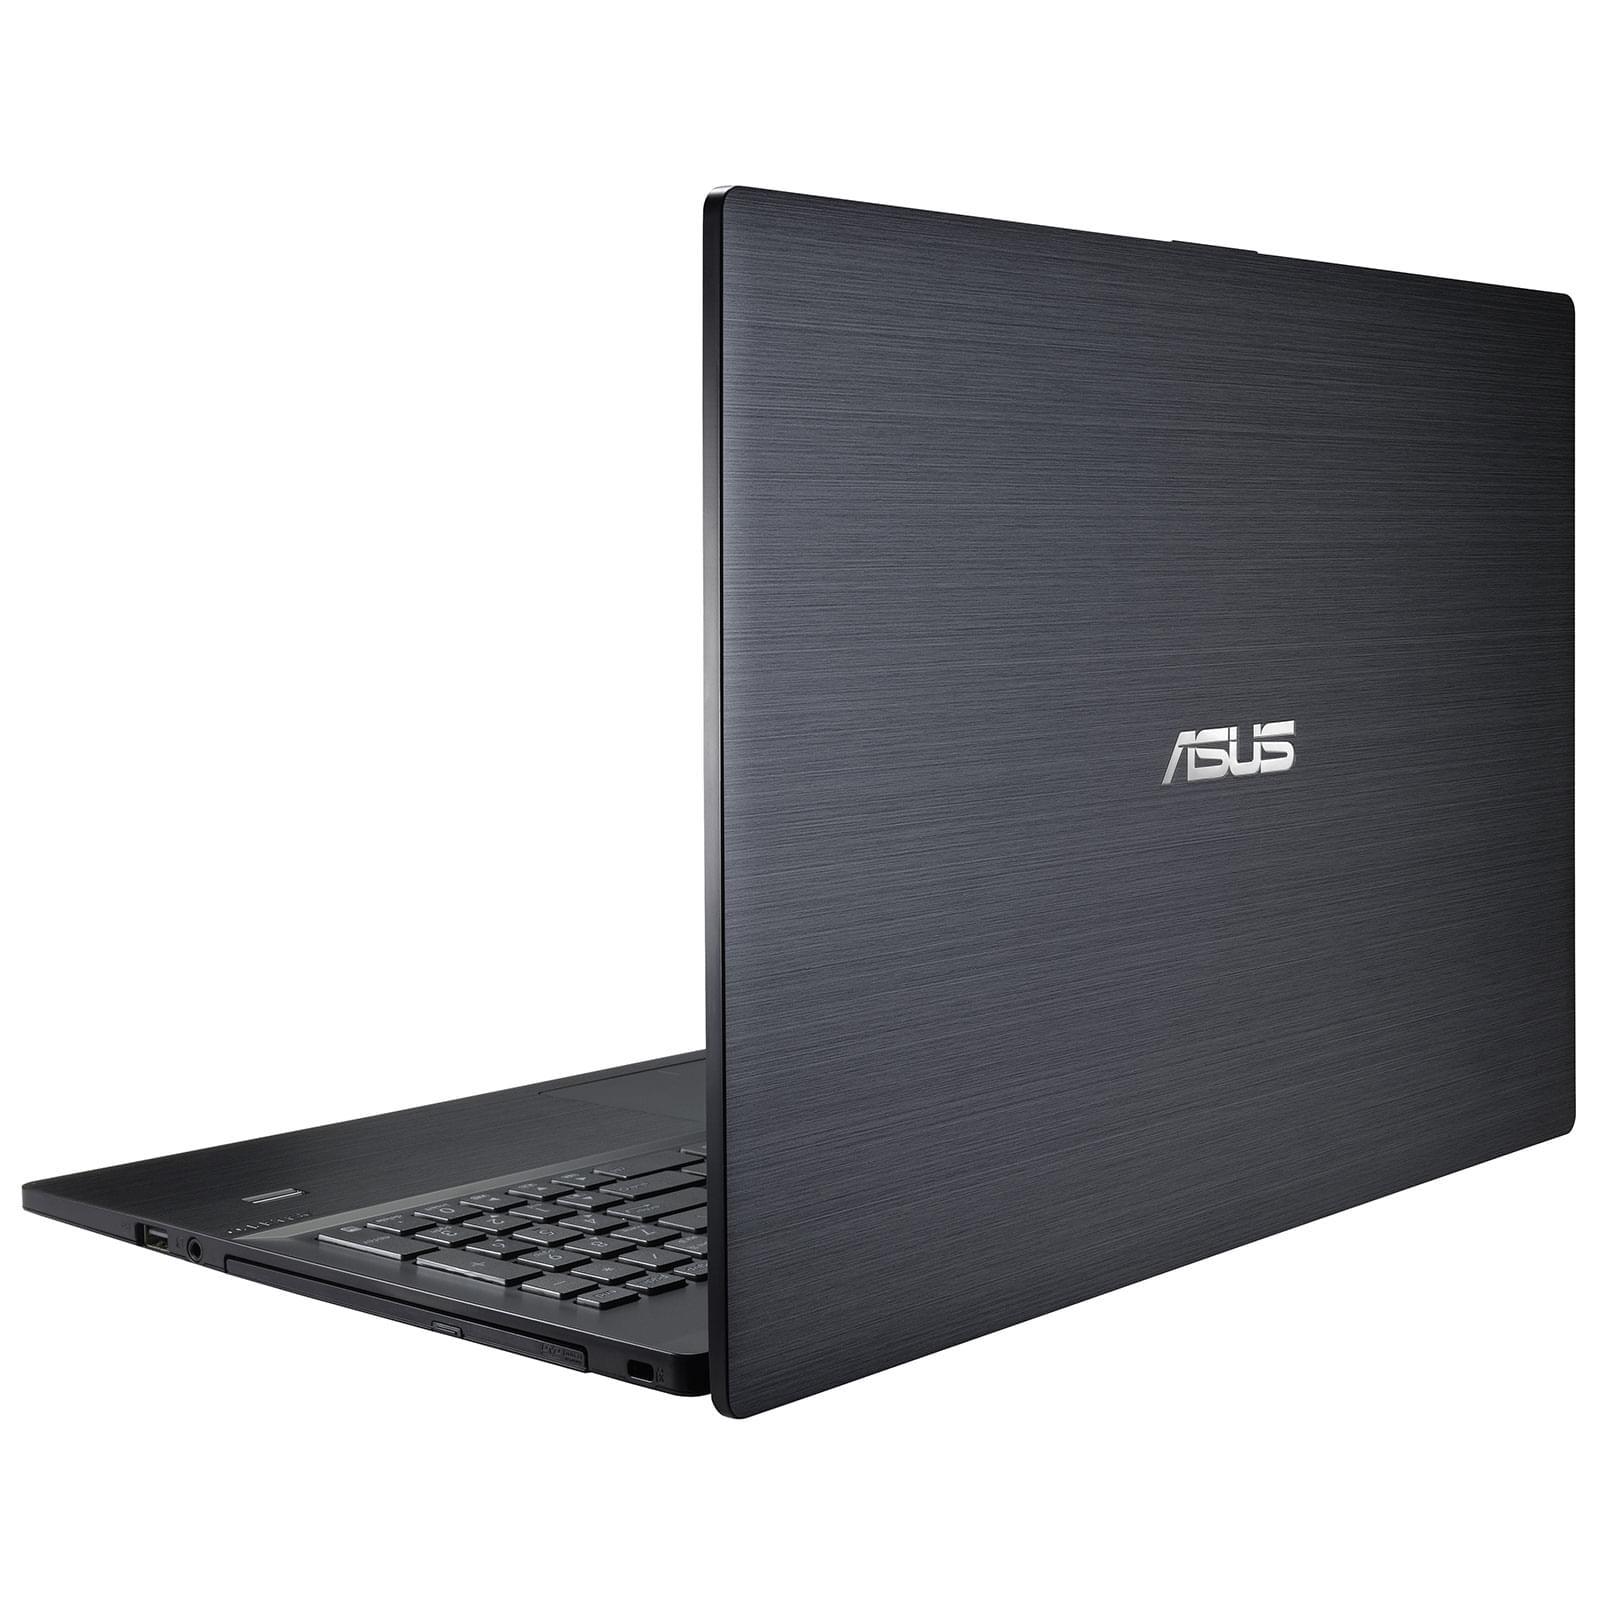 Asus 90NX0051-M13020 - PC portable Asus - Cybertek.fr - 1